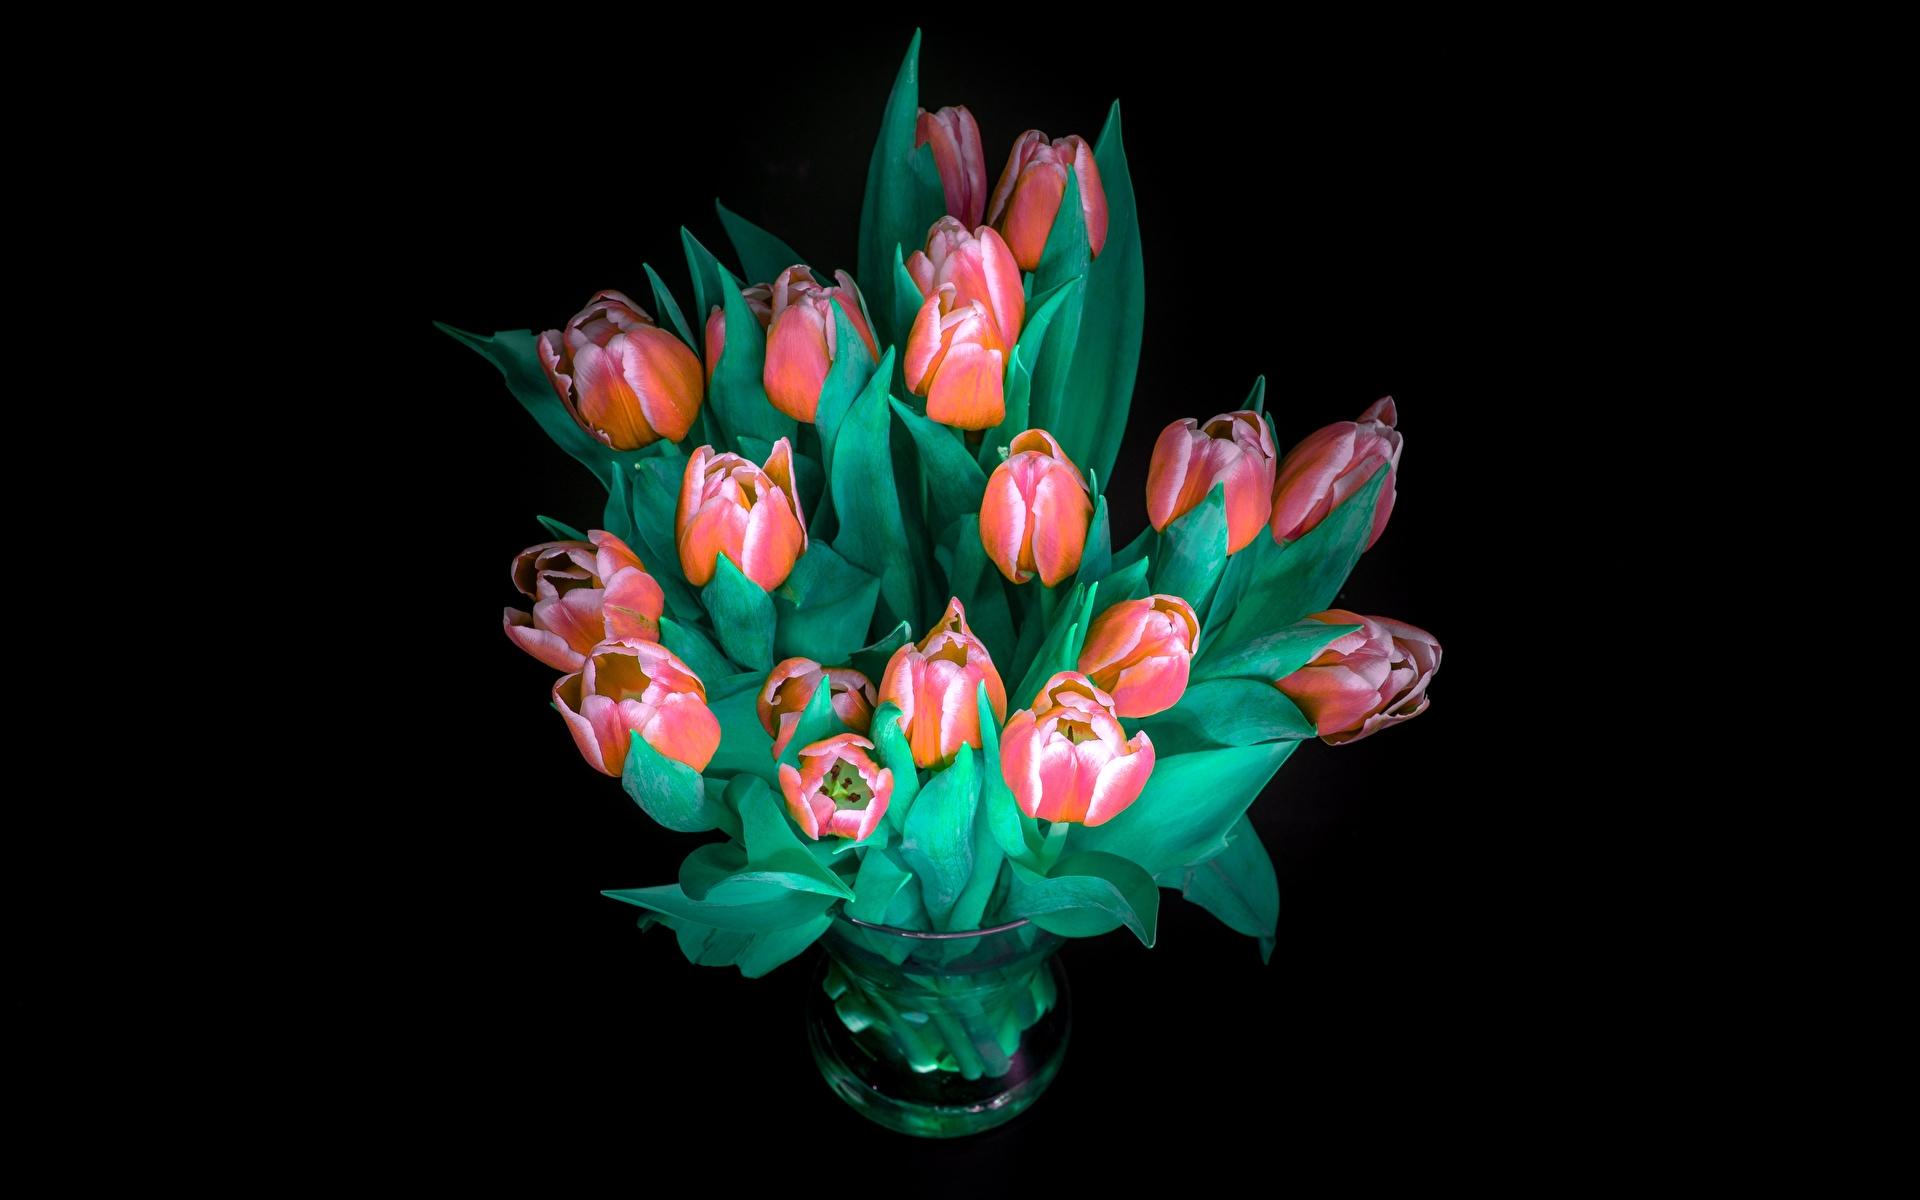 Pictures bouquet Tulips Flowers Black background 1920x1200 Bouquets tulip flower